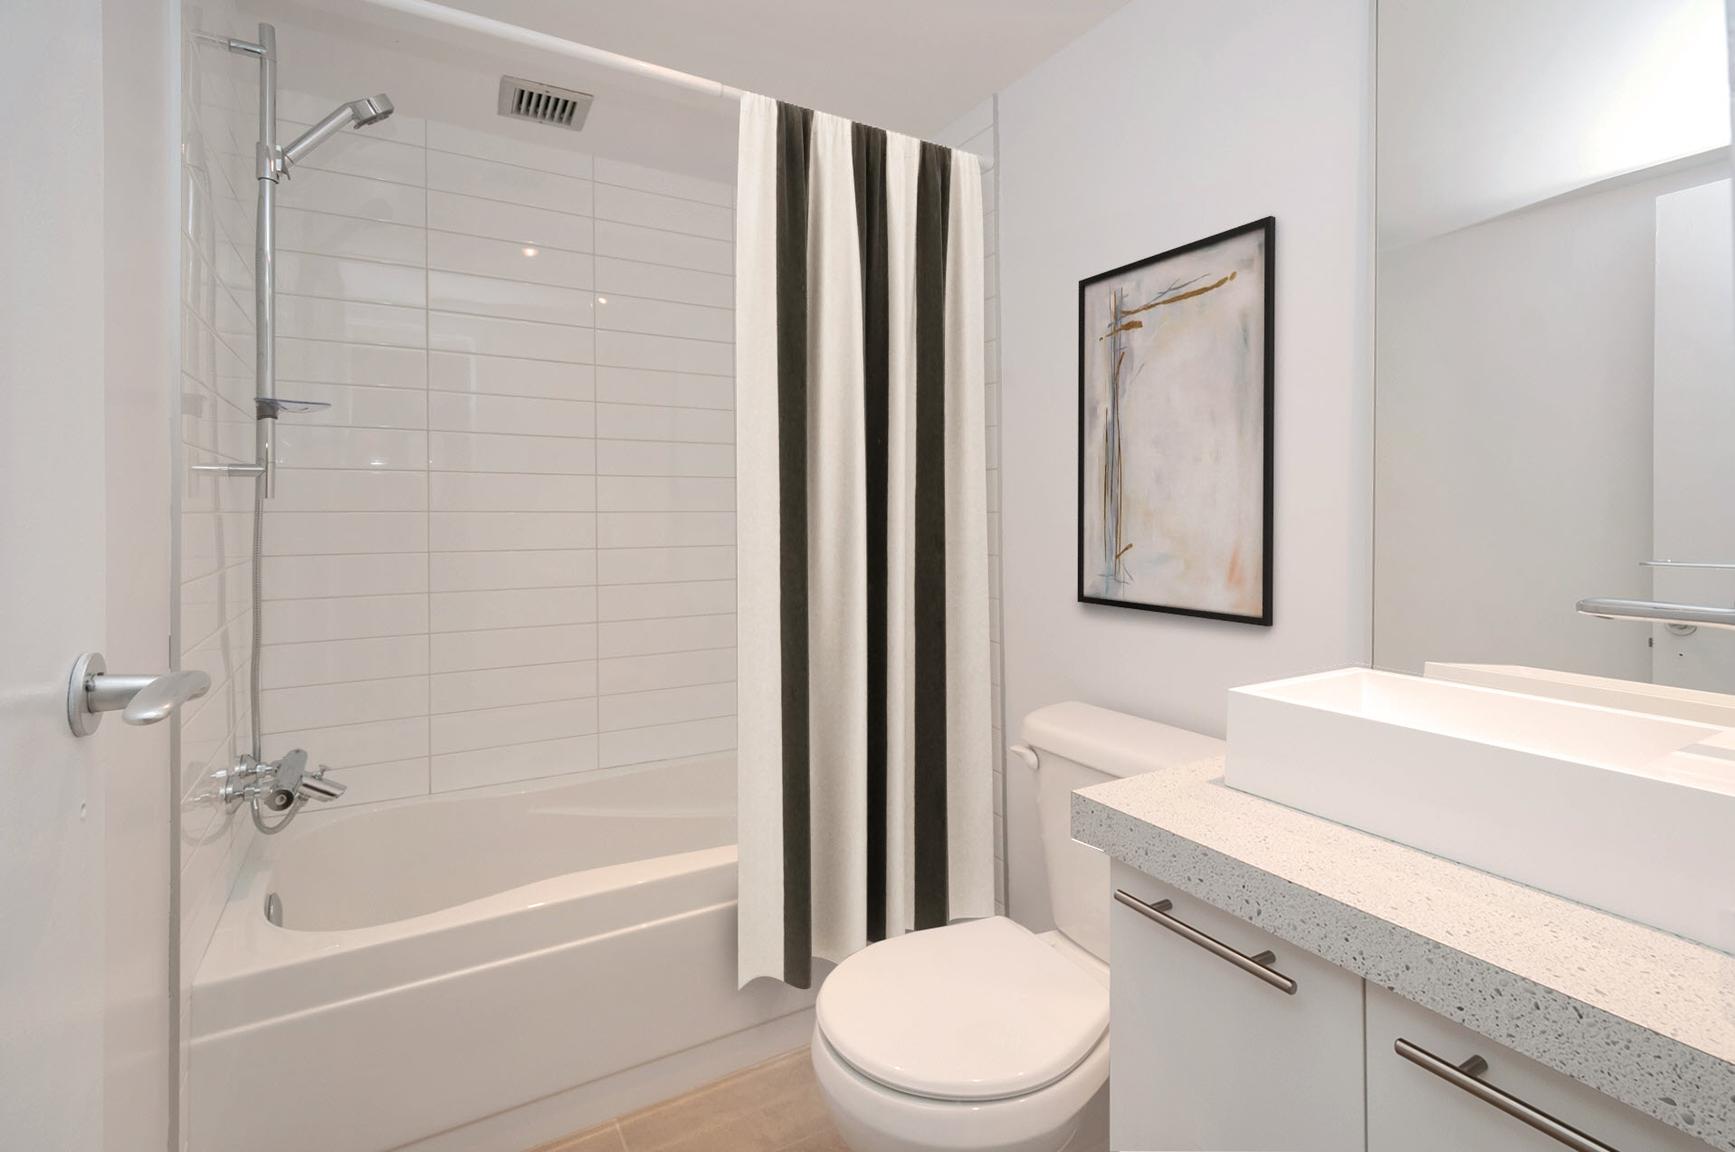 1 bedroom Apartments for rent in Quebec City at Place Samuel de Champlain - Photo 15 - RentersPages – L407129